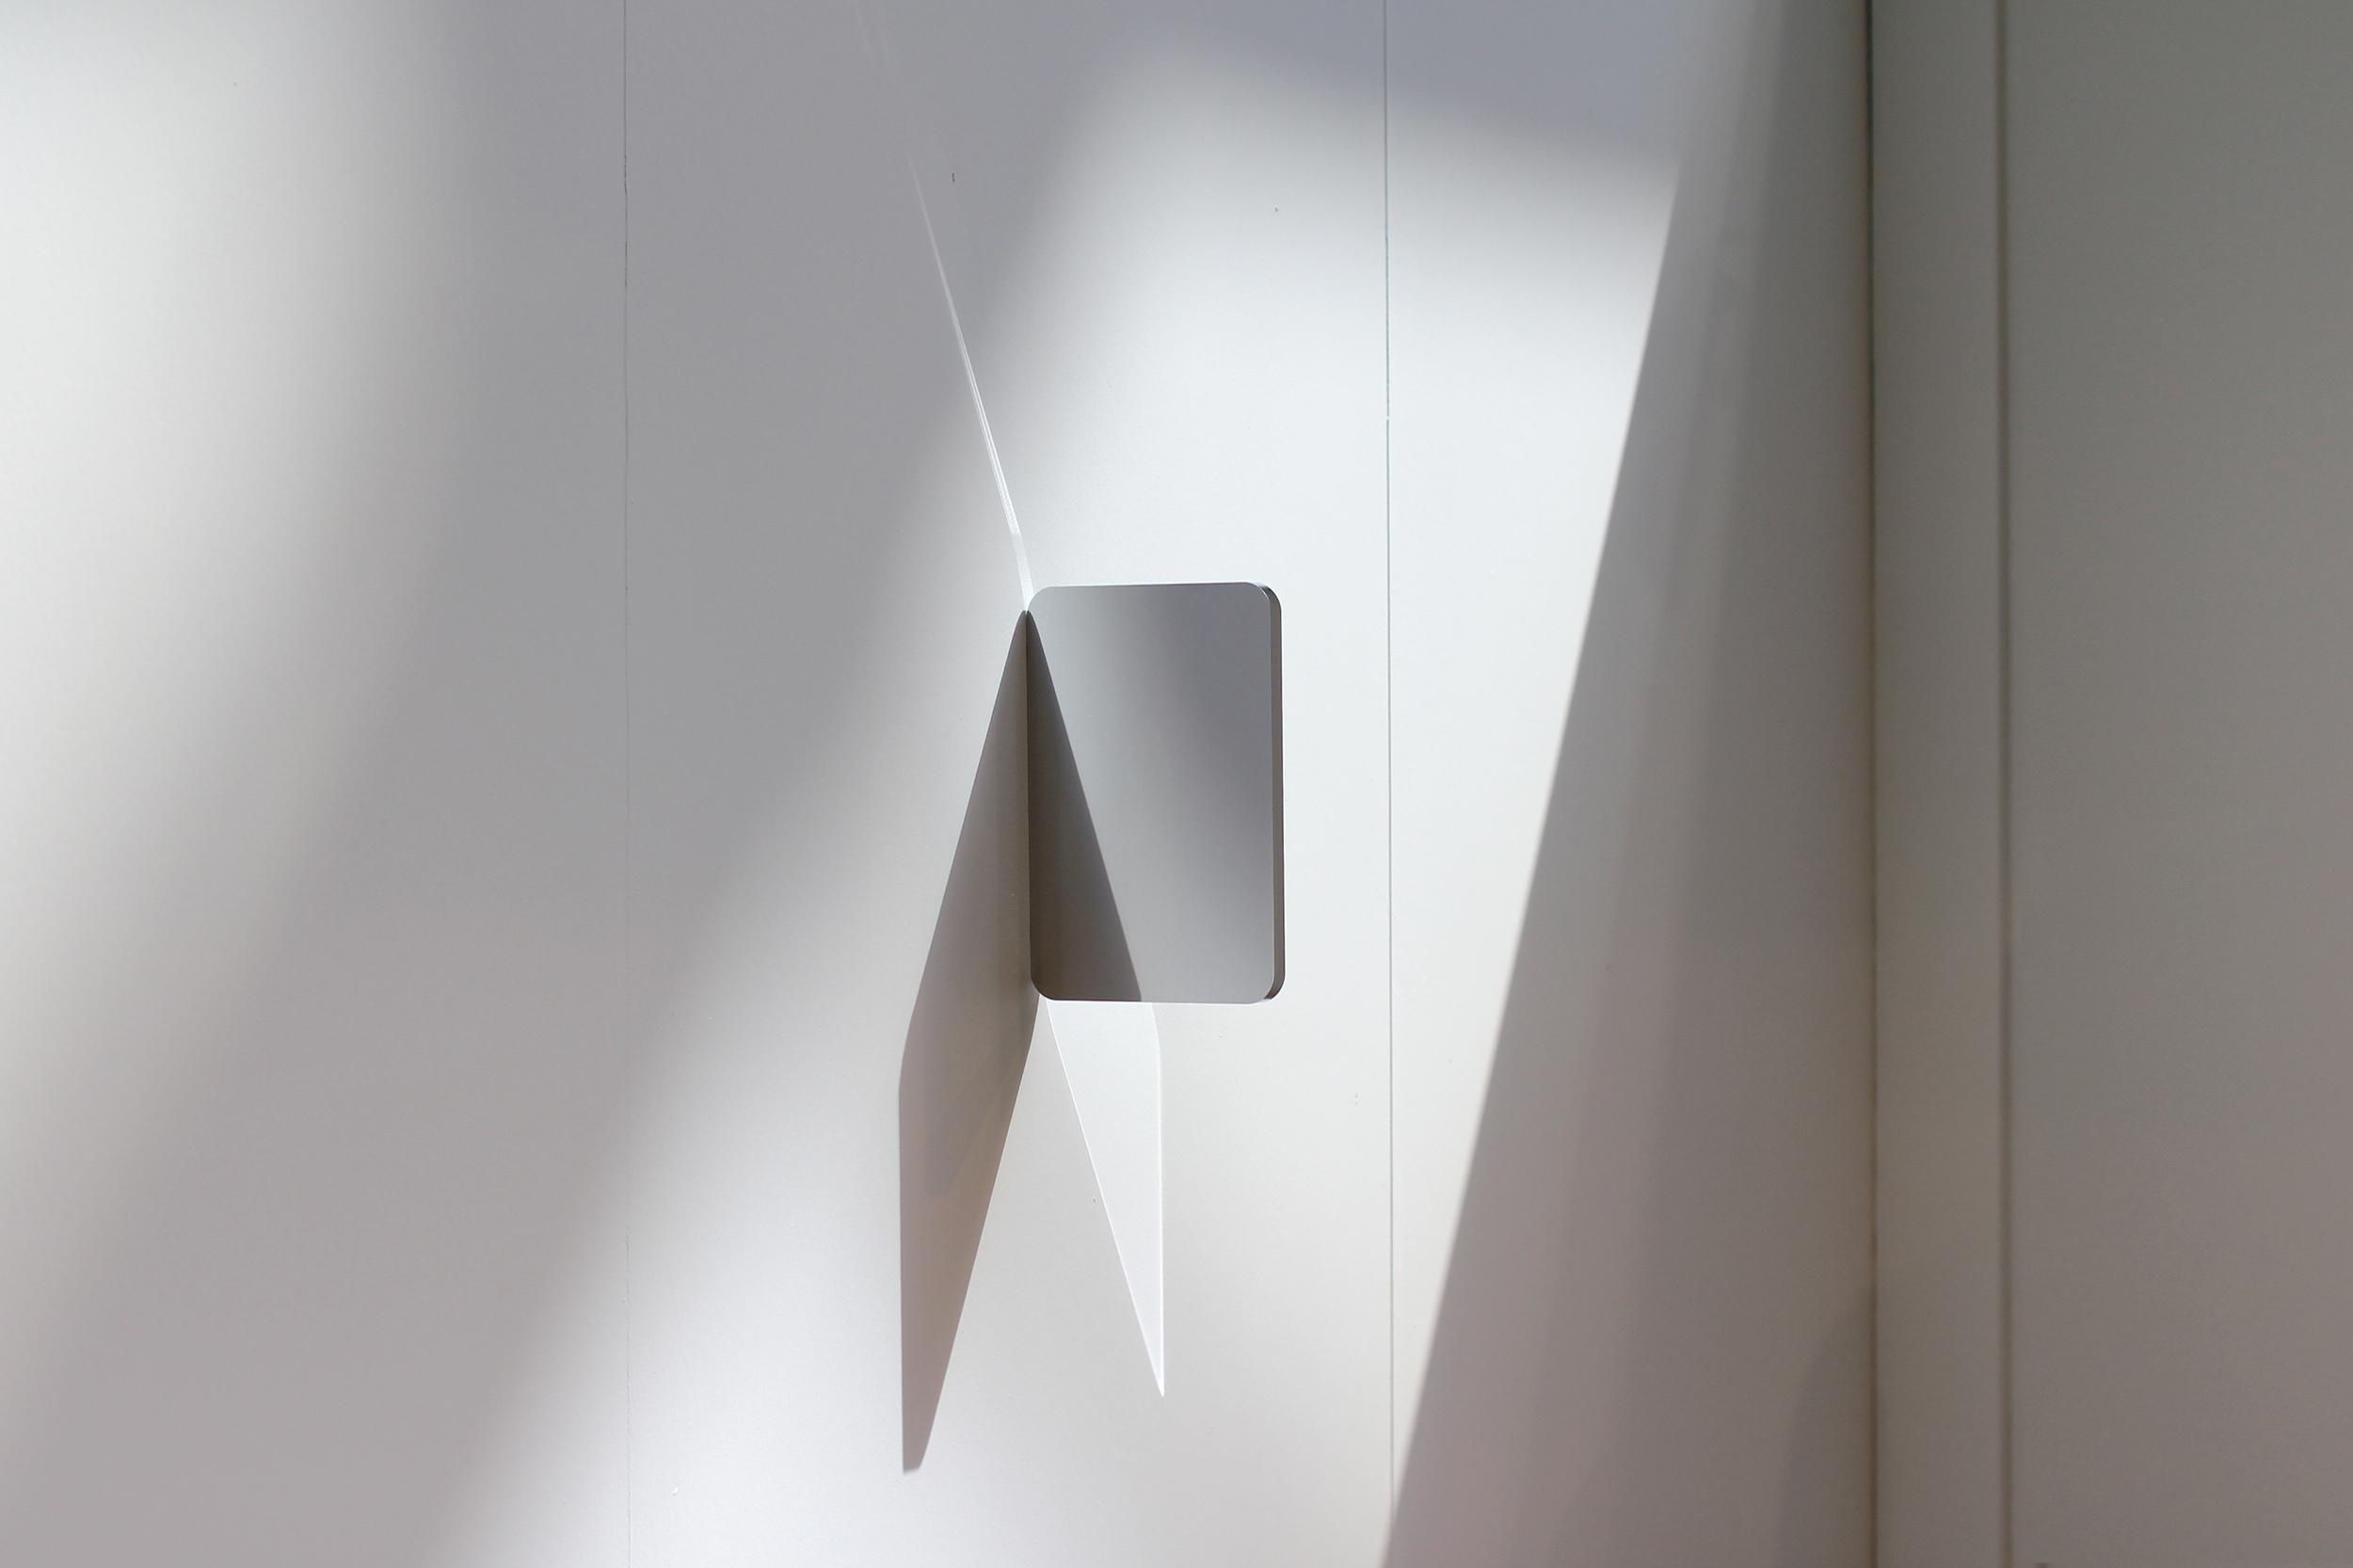 right angle mirror - daniel rybakken 4.jpg